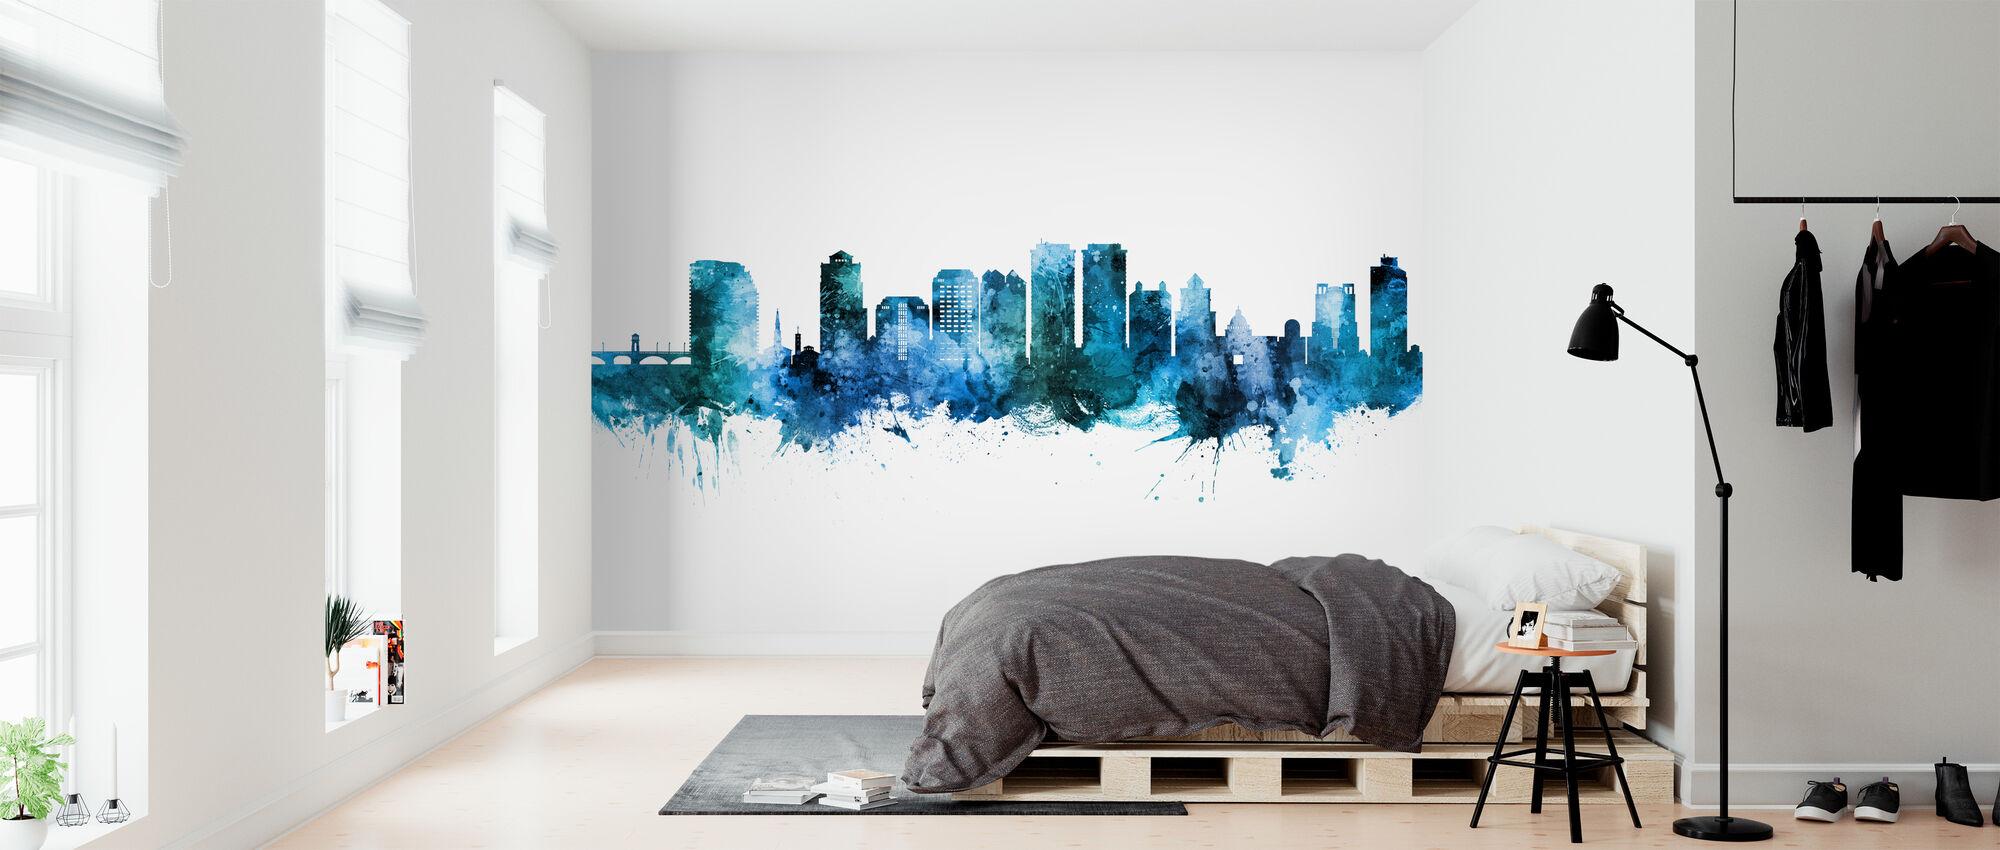 West Palm Beach Florida Skyline - Wallpaper - Bedroom